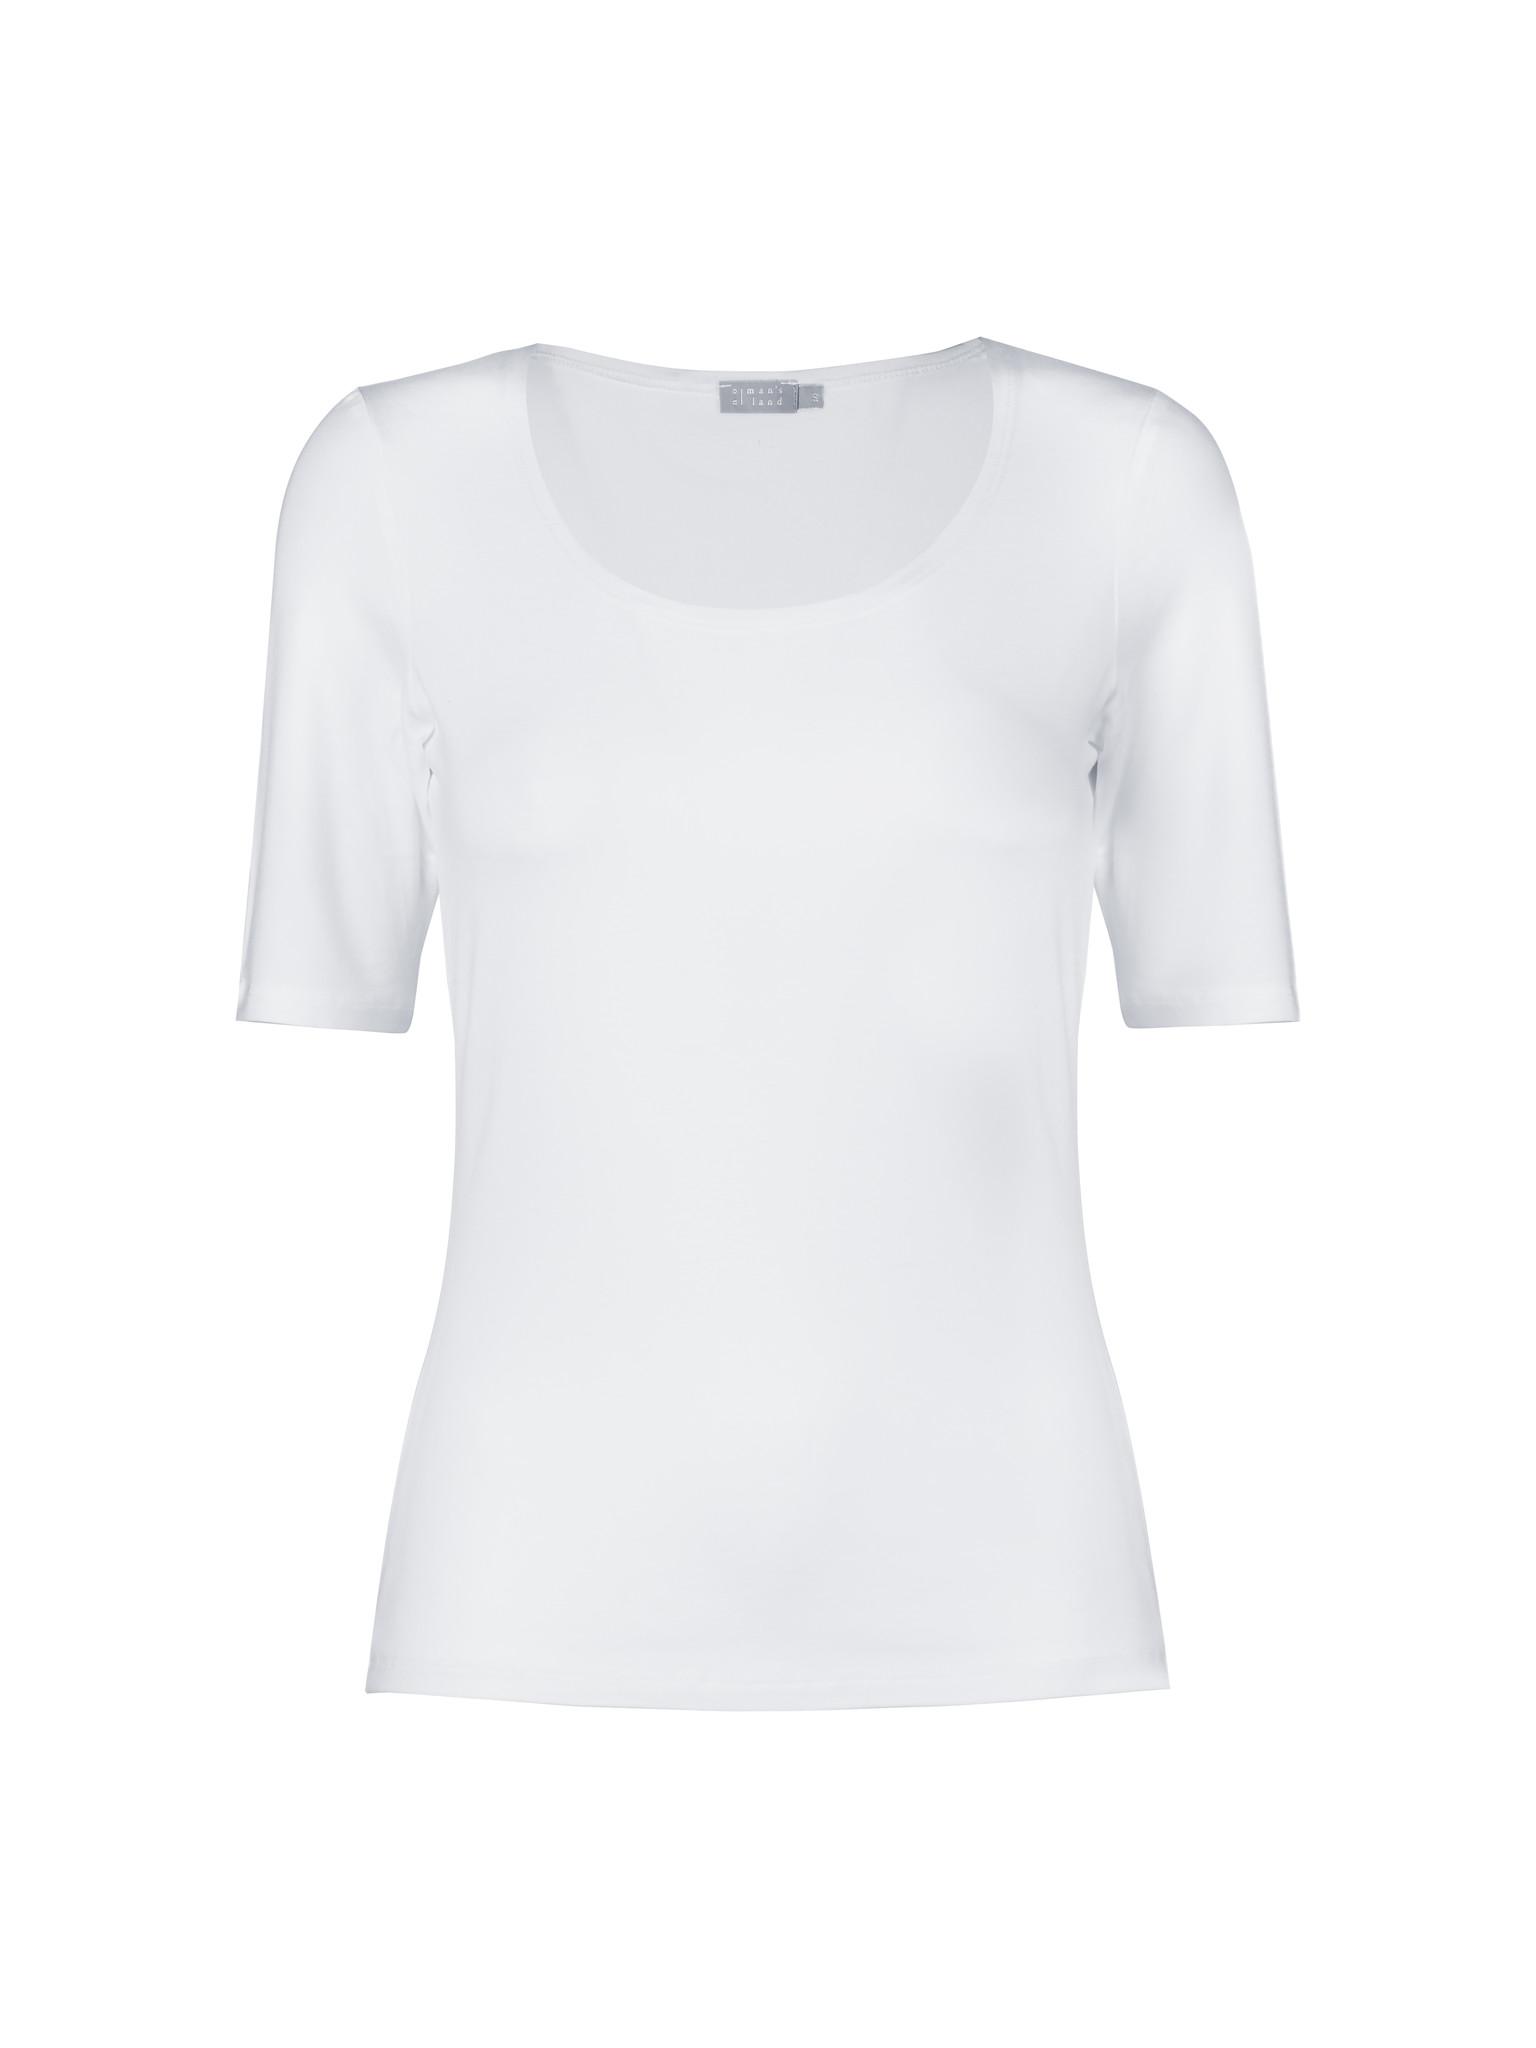 nomansland T-shirt 00.002  White-1